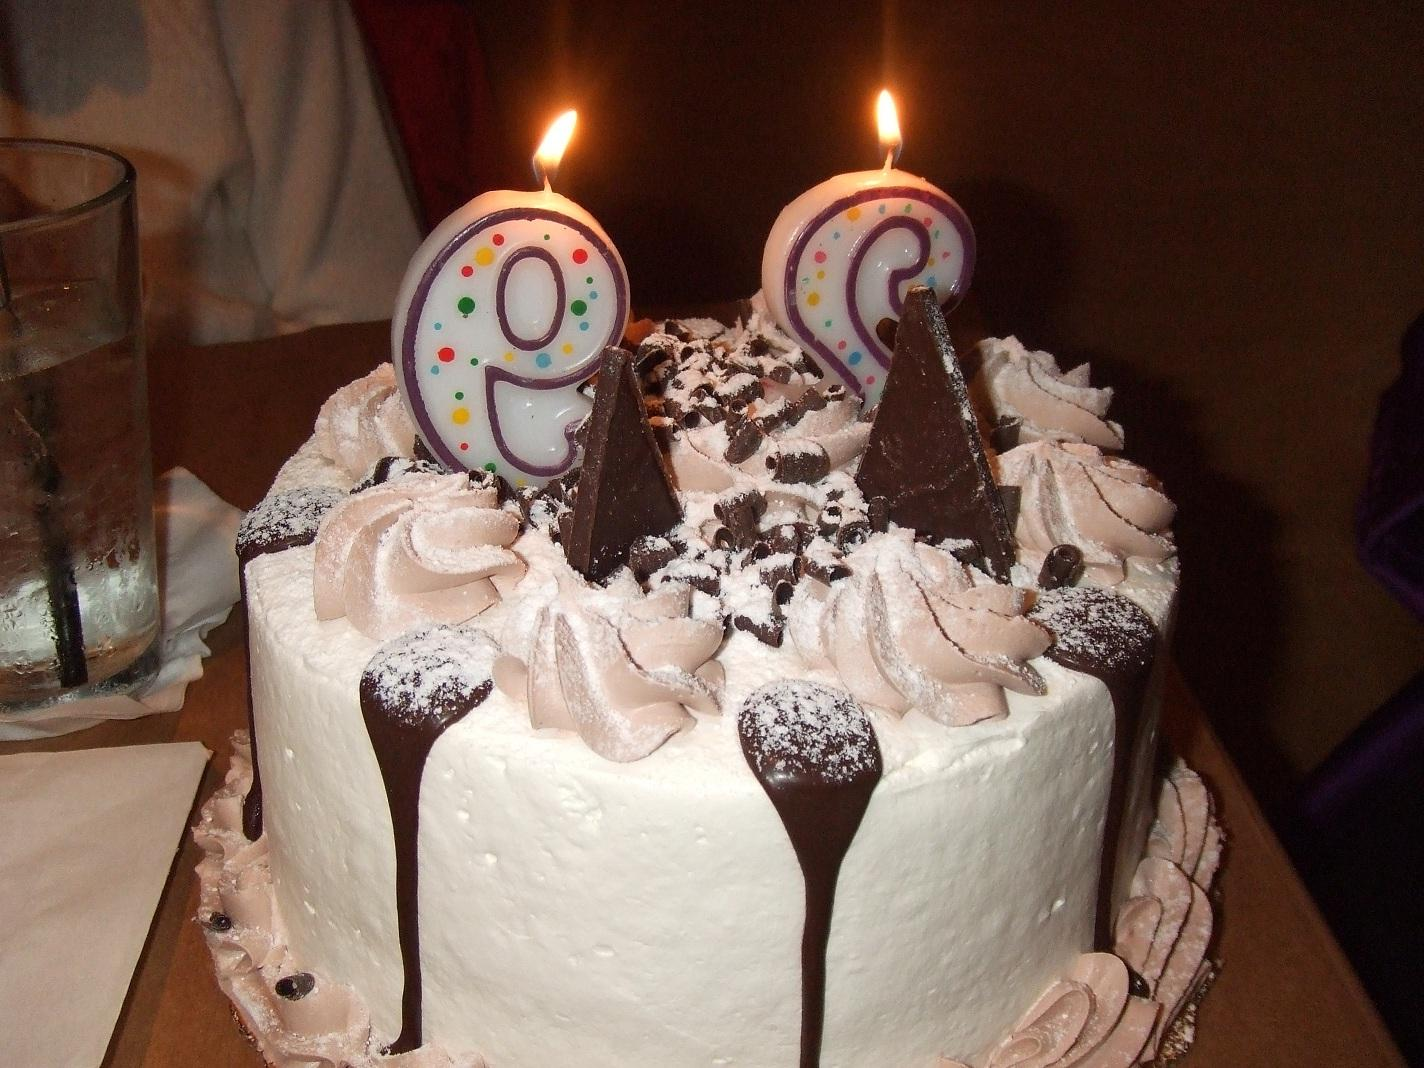 Daranesha S Blog Publix Wedding Cakes Beach